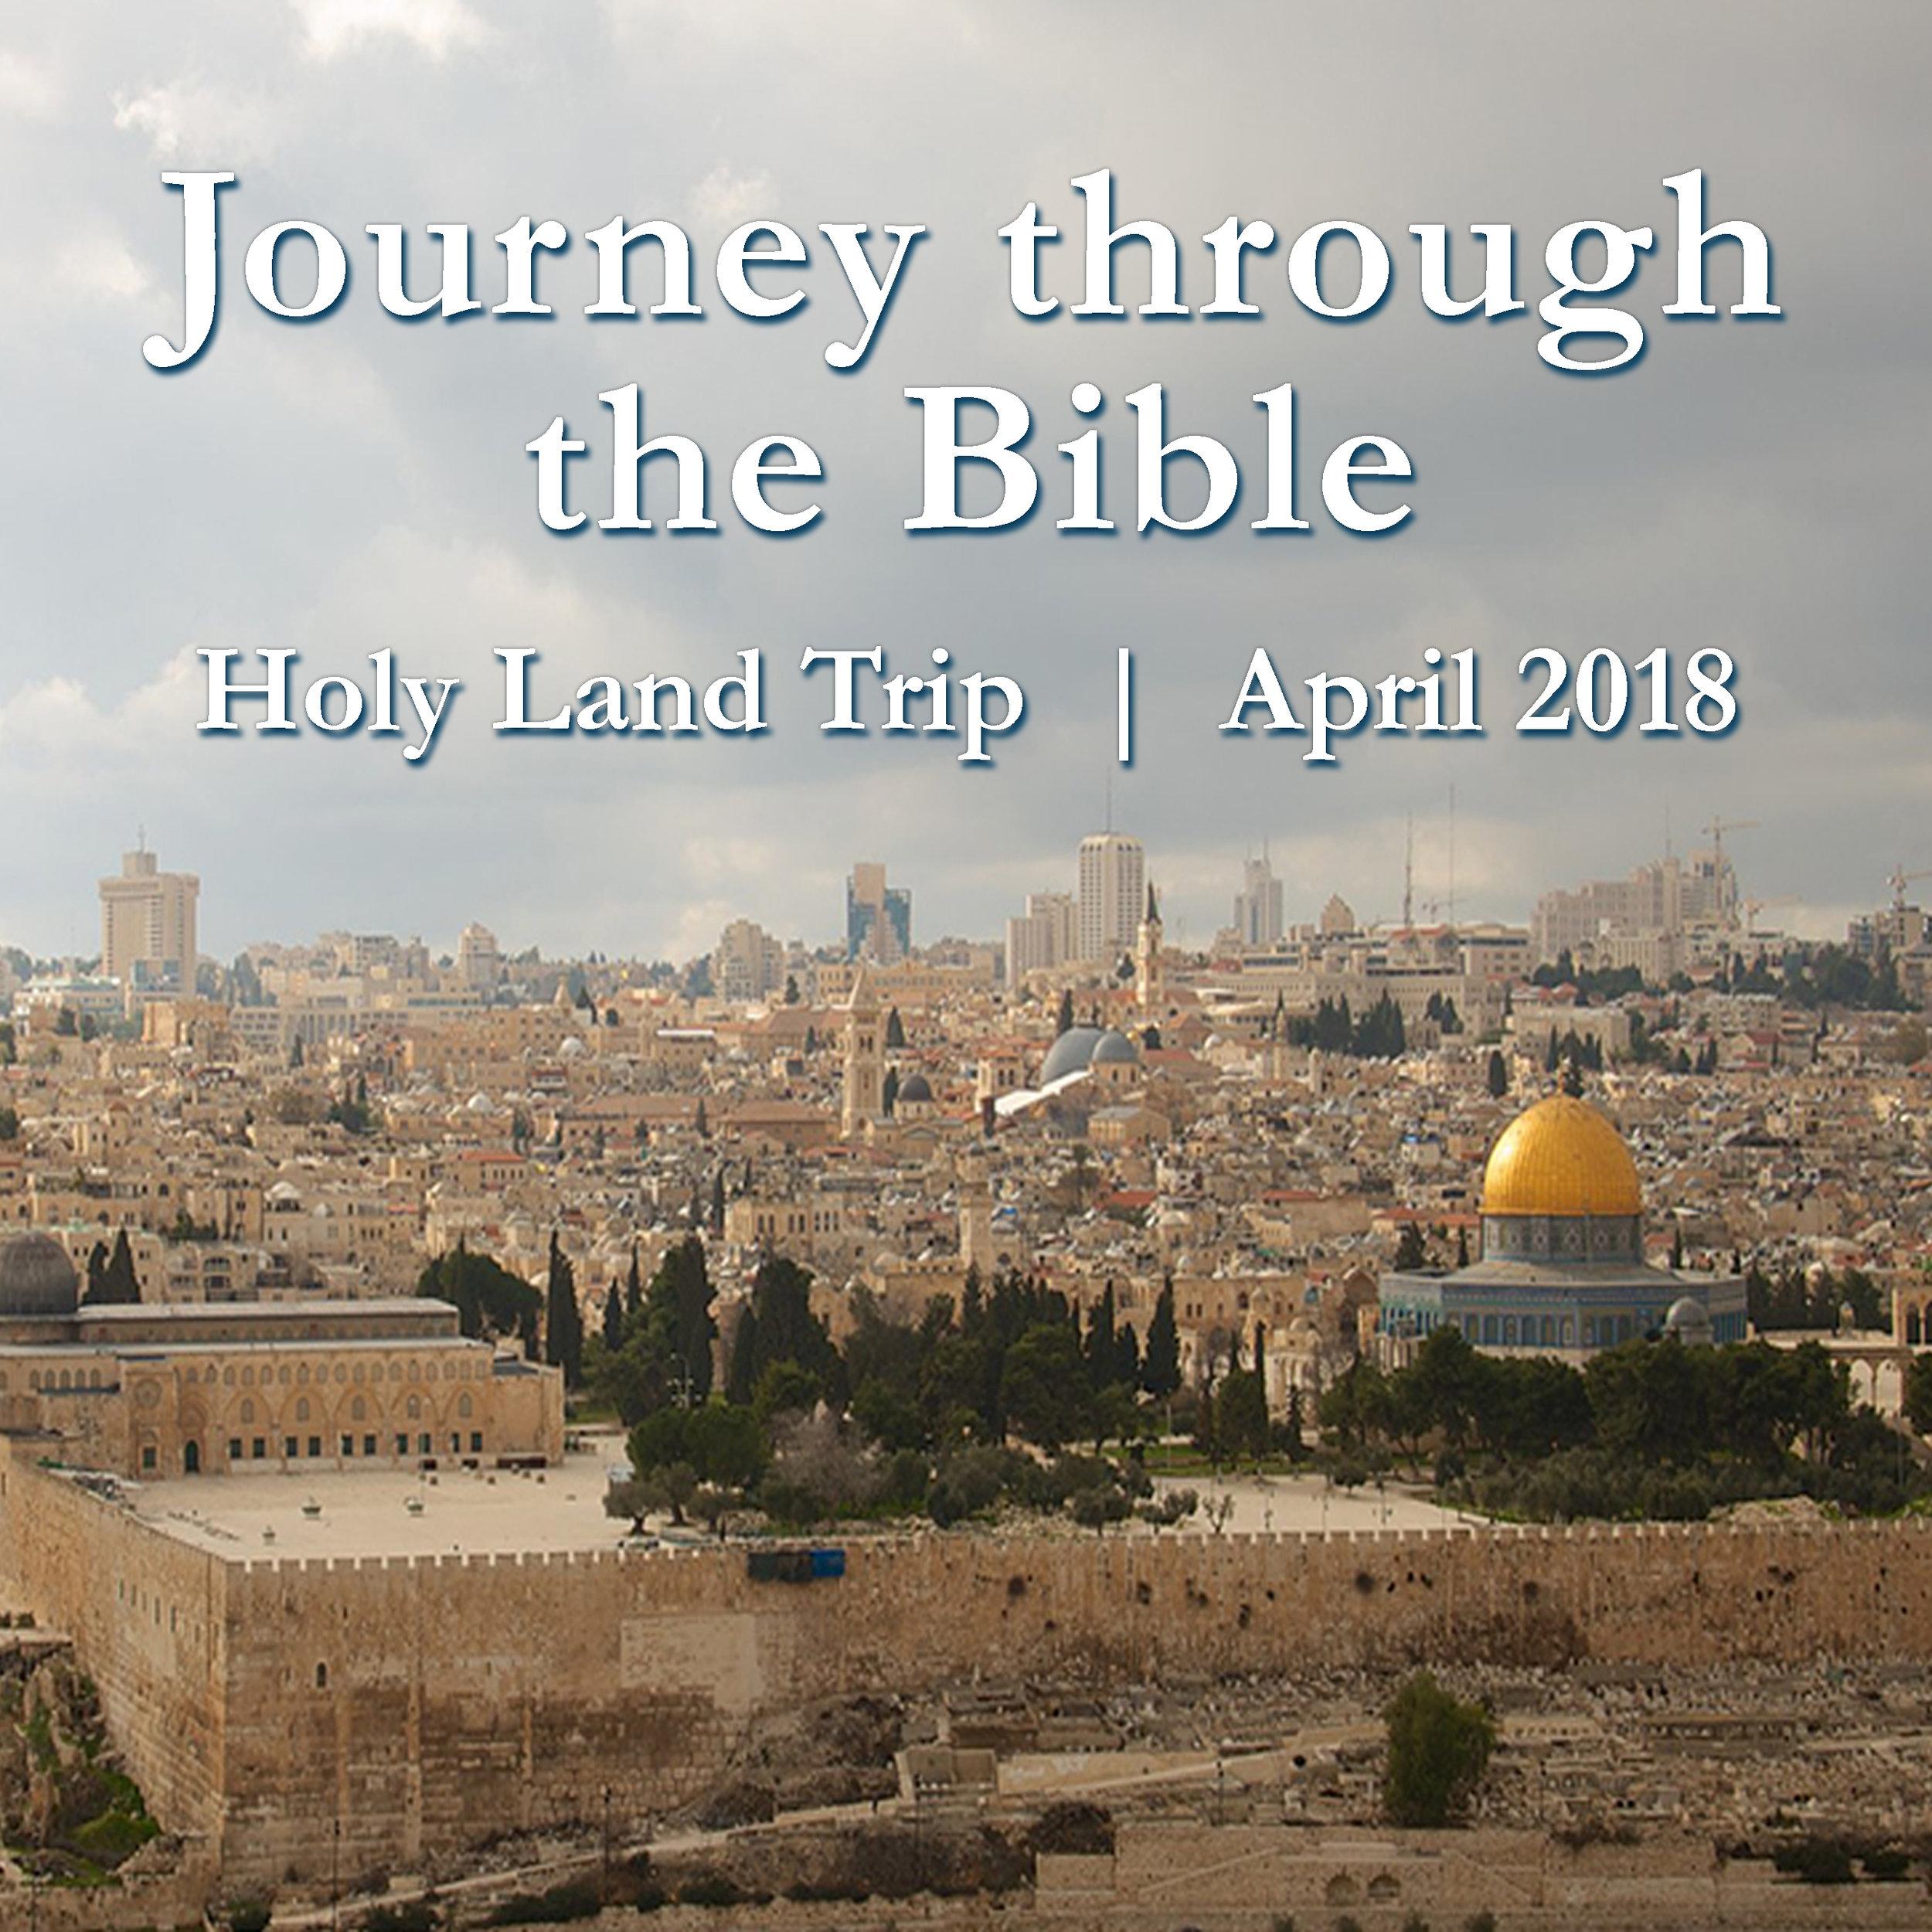 sm_holy_land_trip_2018.jpg